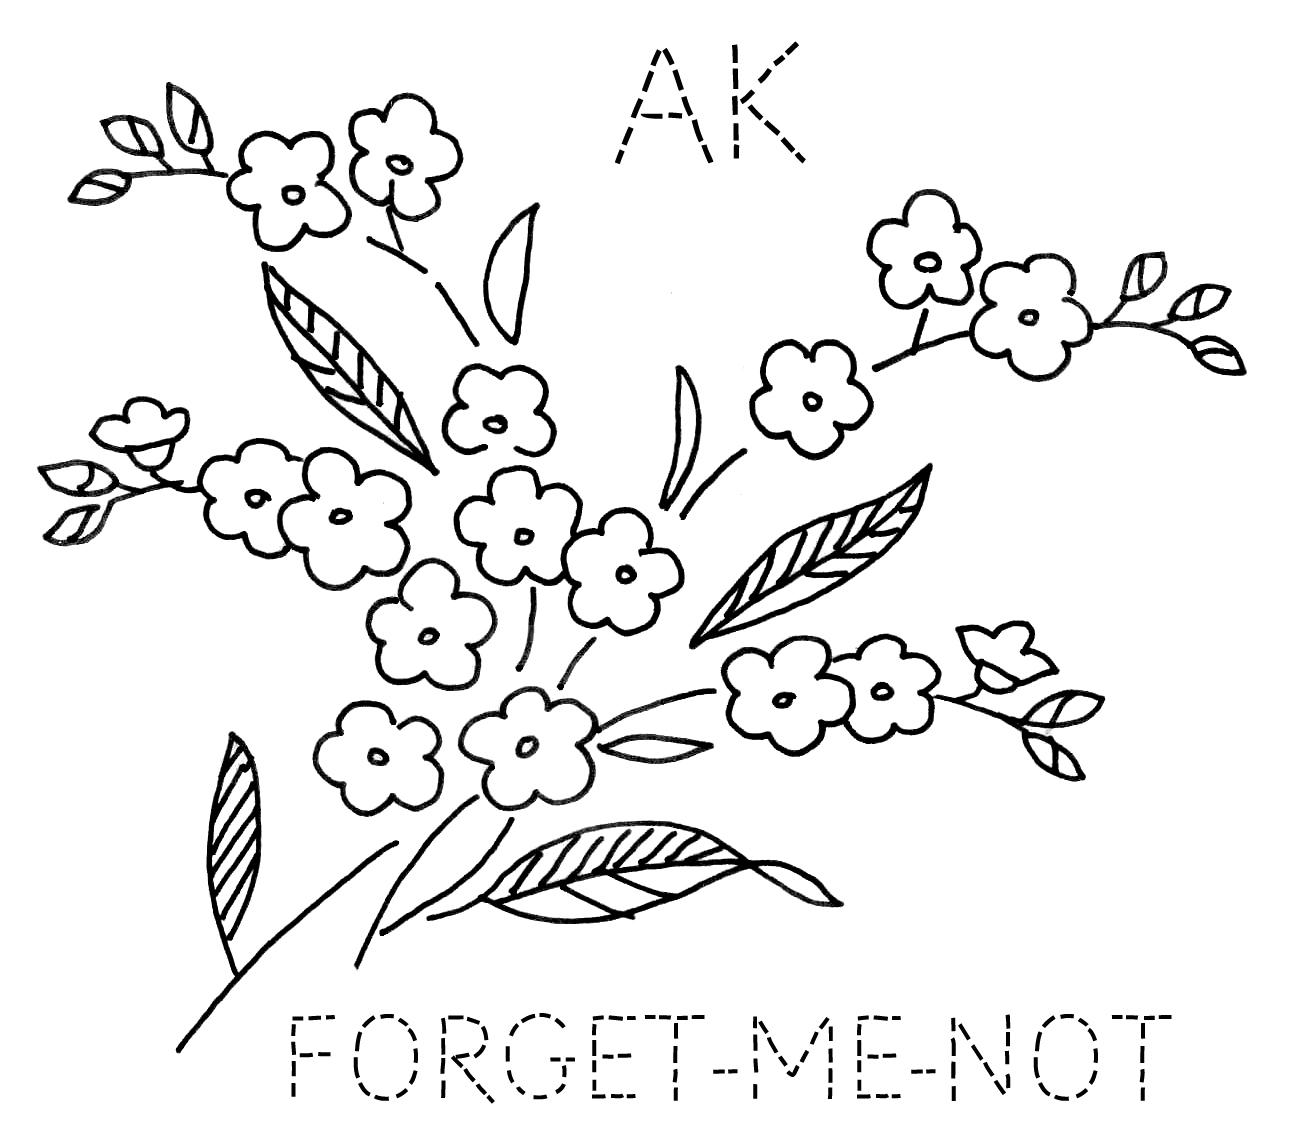 Drawing at getdrawings com. Alaska clipart sketch